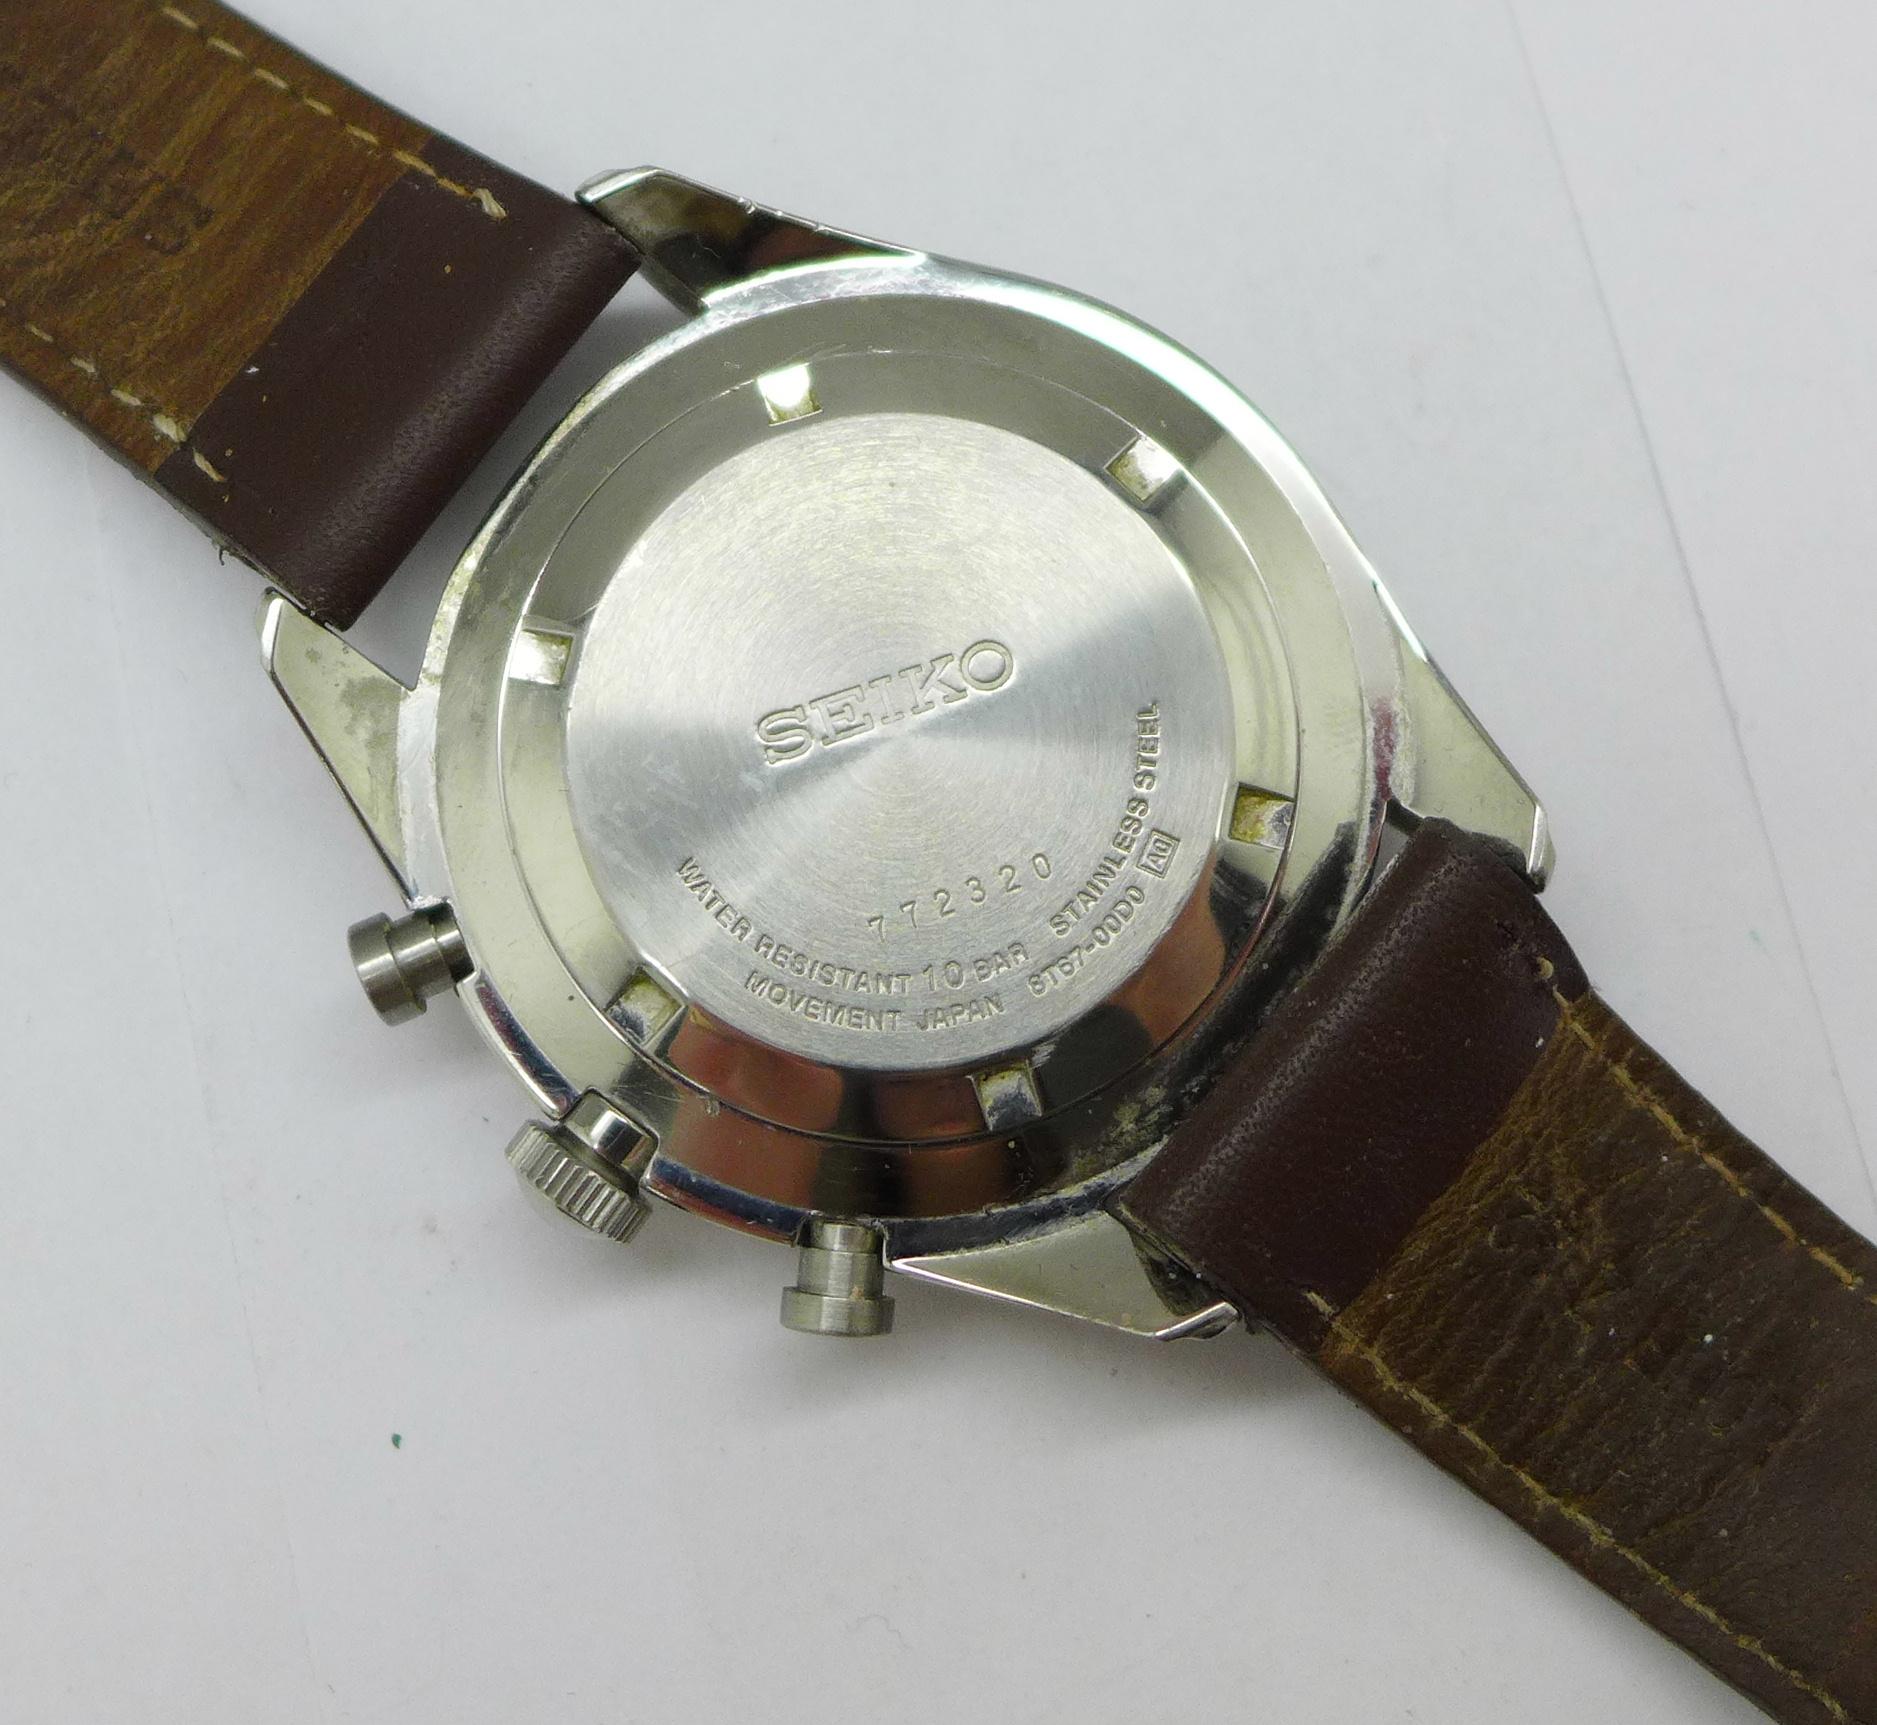 A Seiko chronograph wristwatch - Image 4 of 6